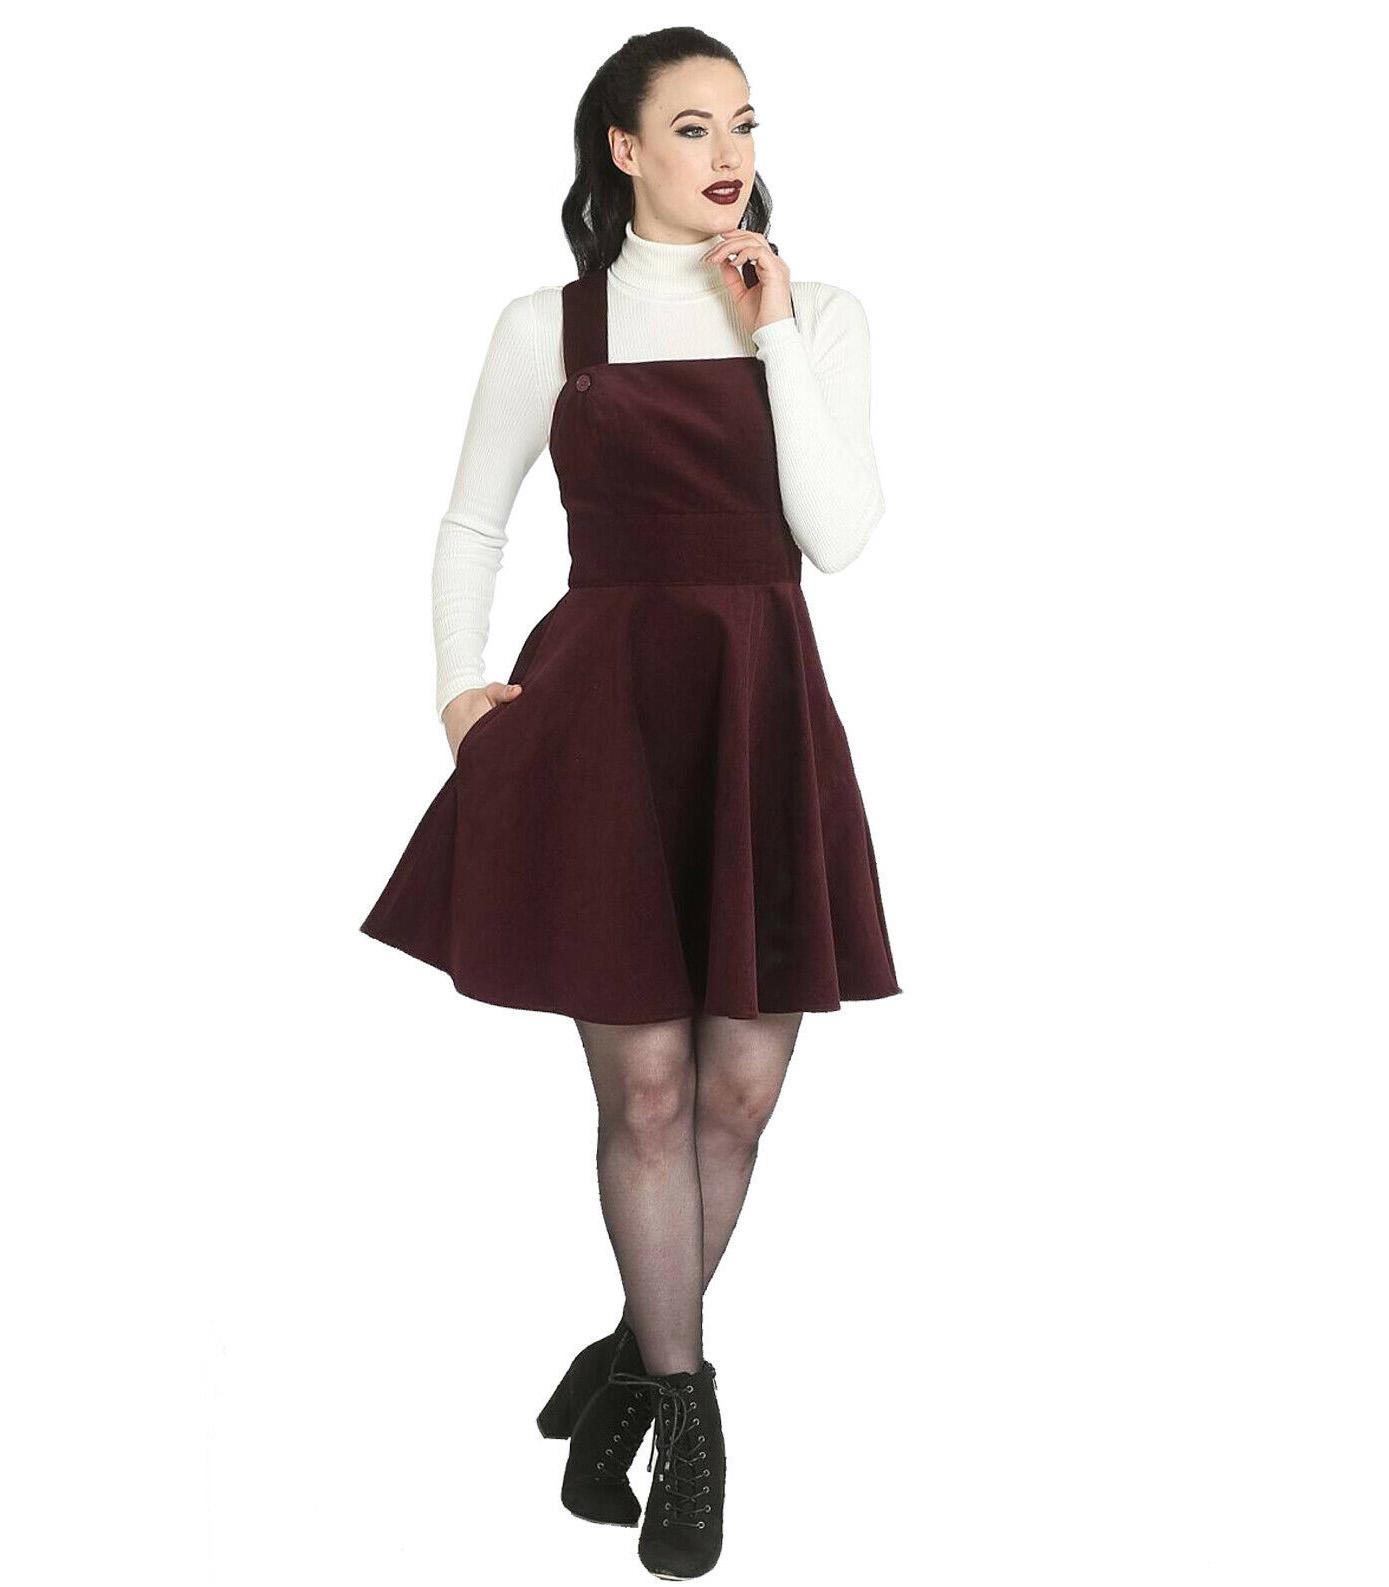 Hell-Bunny-Rockabilly-Corduroy-Mini-Dress-WONDER-YEARS-Pinafore-Wine-All-Sizes thumbnail 15